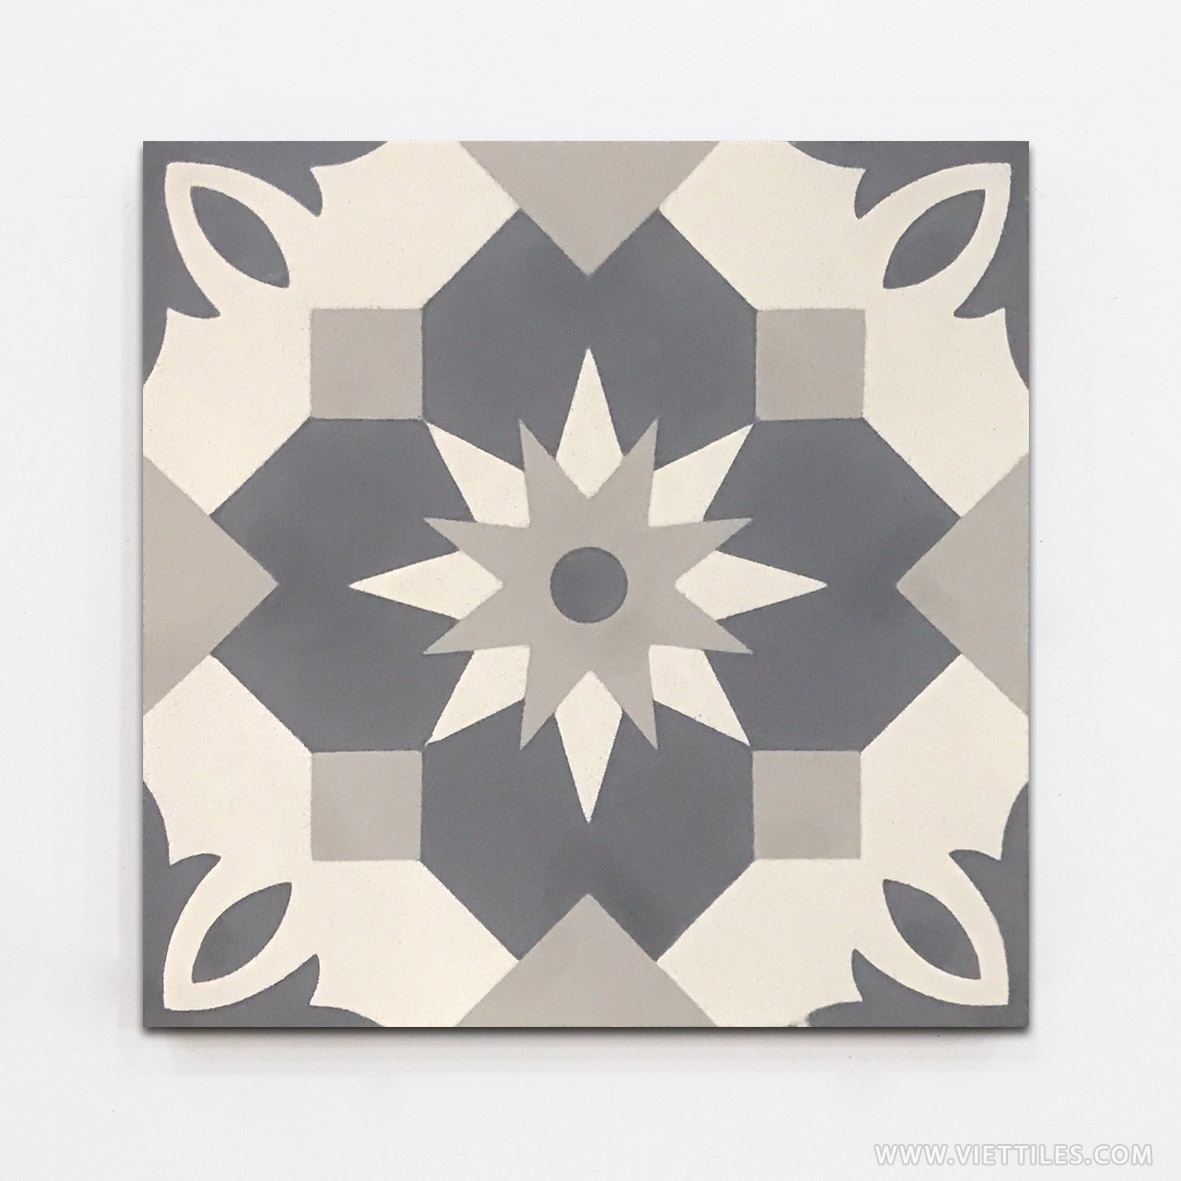 V20-1163-T01 Cement Tile